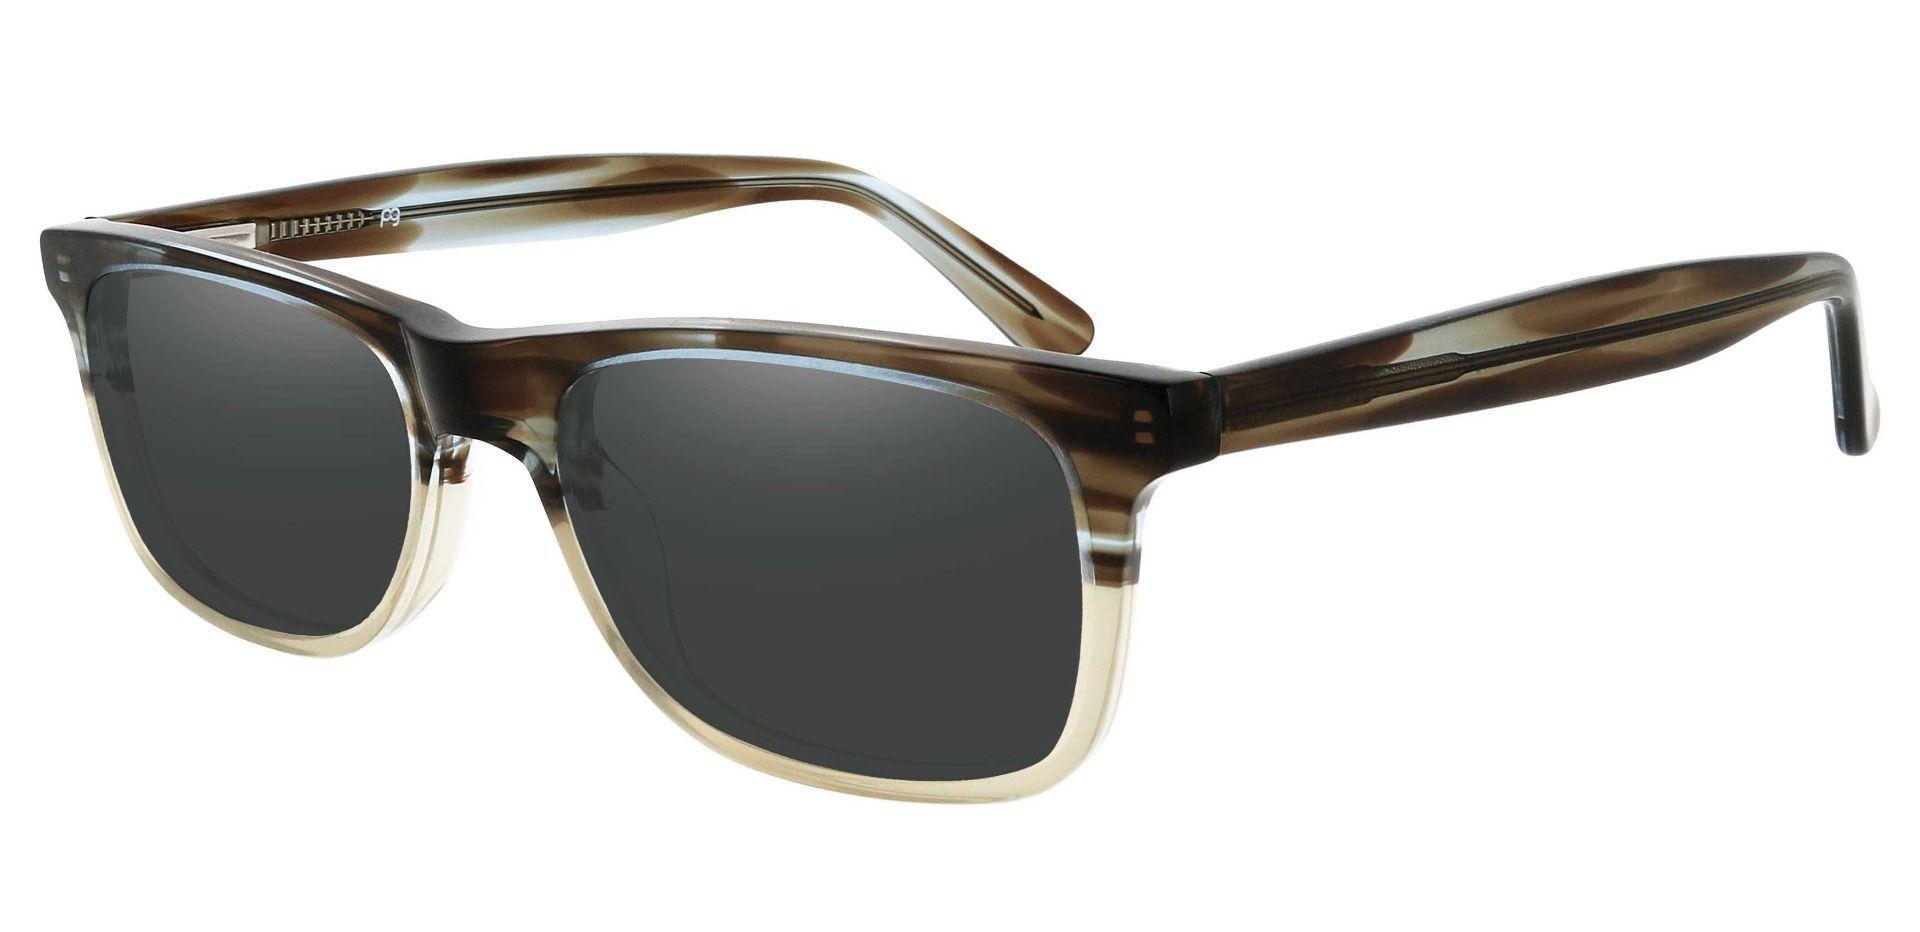 Denali Rectangle Prescription Sunglasses - Multi Color Frame With Gray Lenses